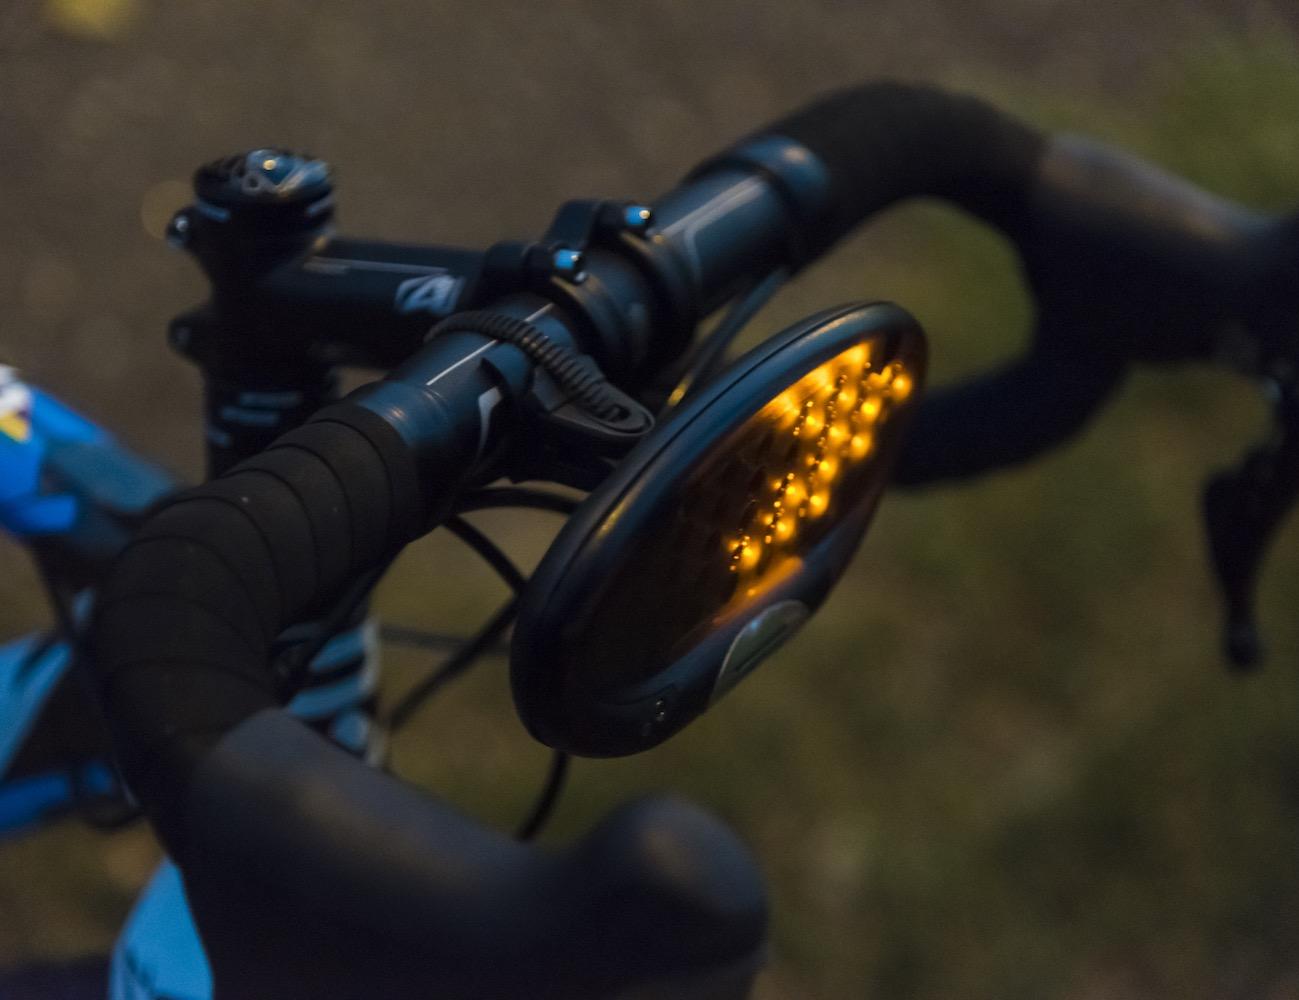 turncycle-the-safest-bike-signalling-light-01